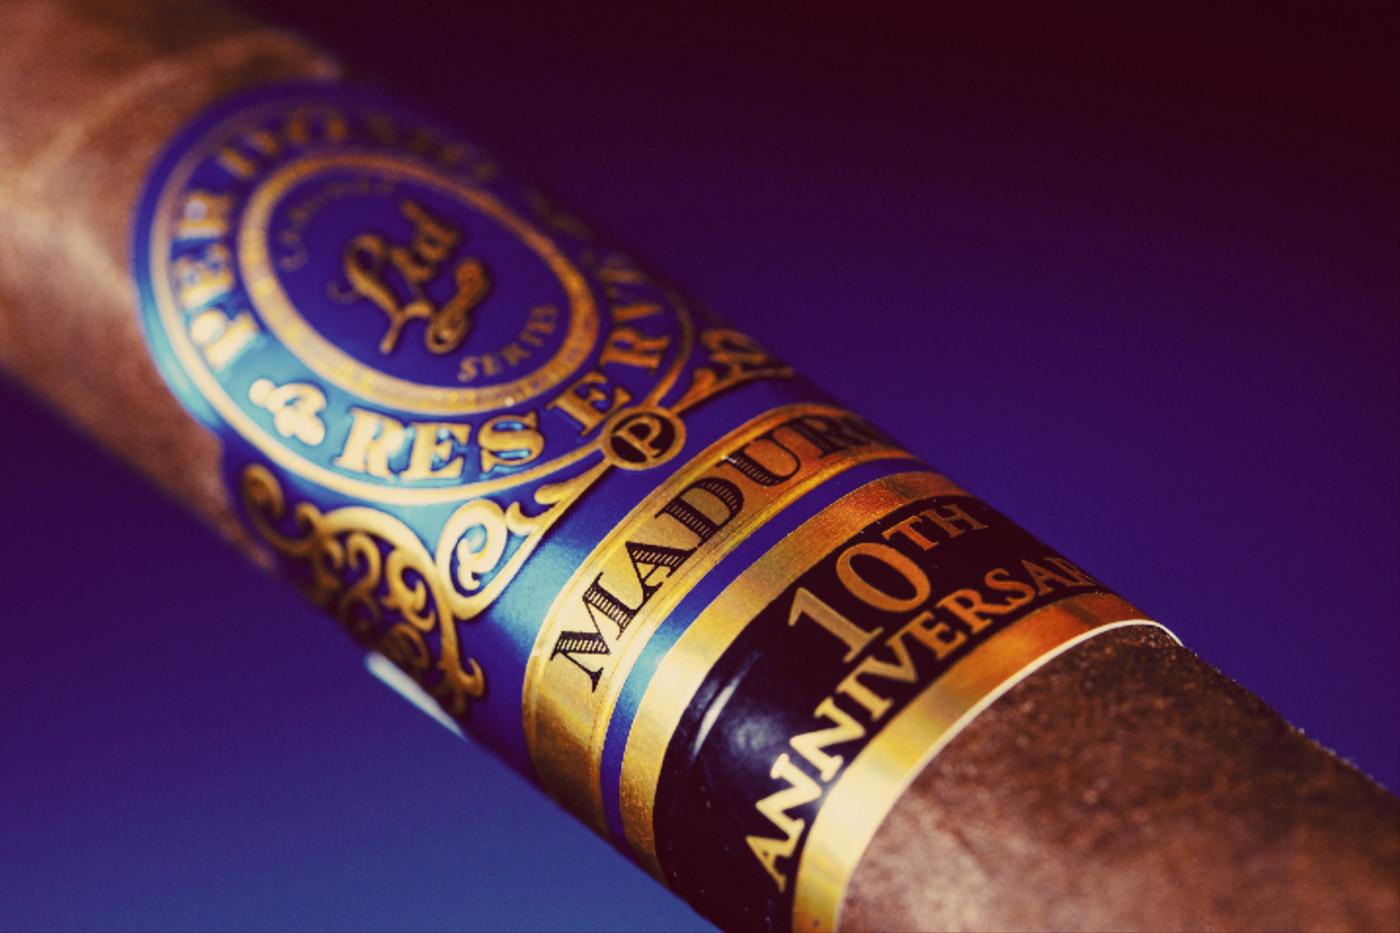 Perdomo Reserve 10th Anniversary Box-Pressed Maduro Epicure cigar review